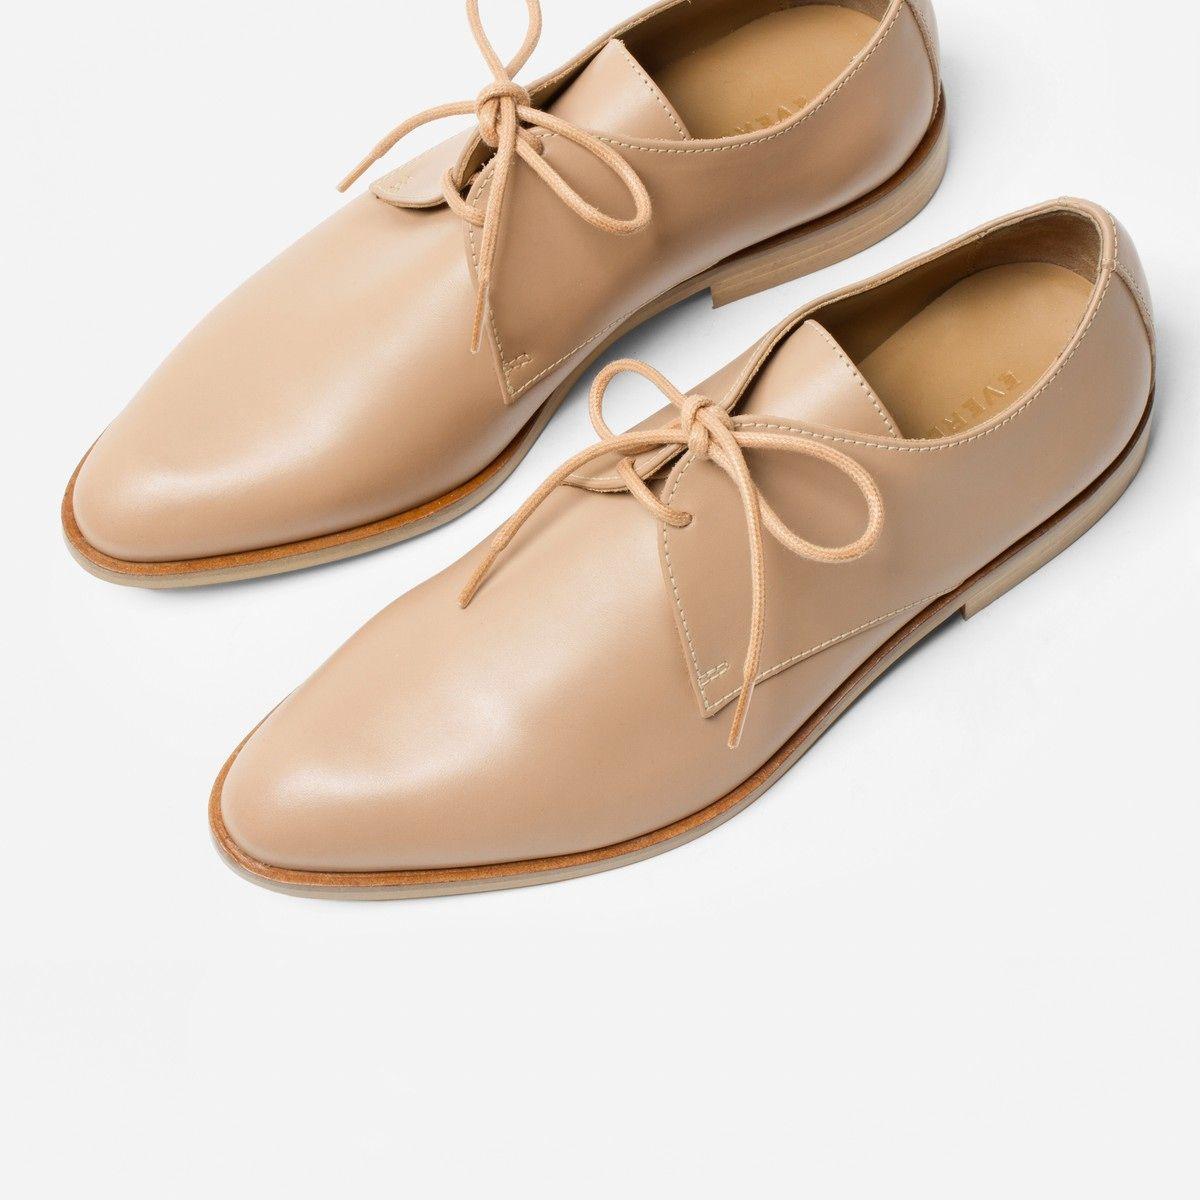 46c7f7ff558 The 21 Best Dress Shoes for Men - Gear Patrol